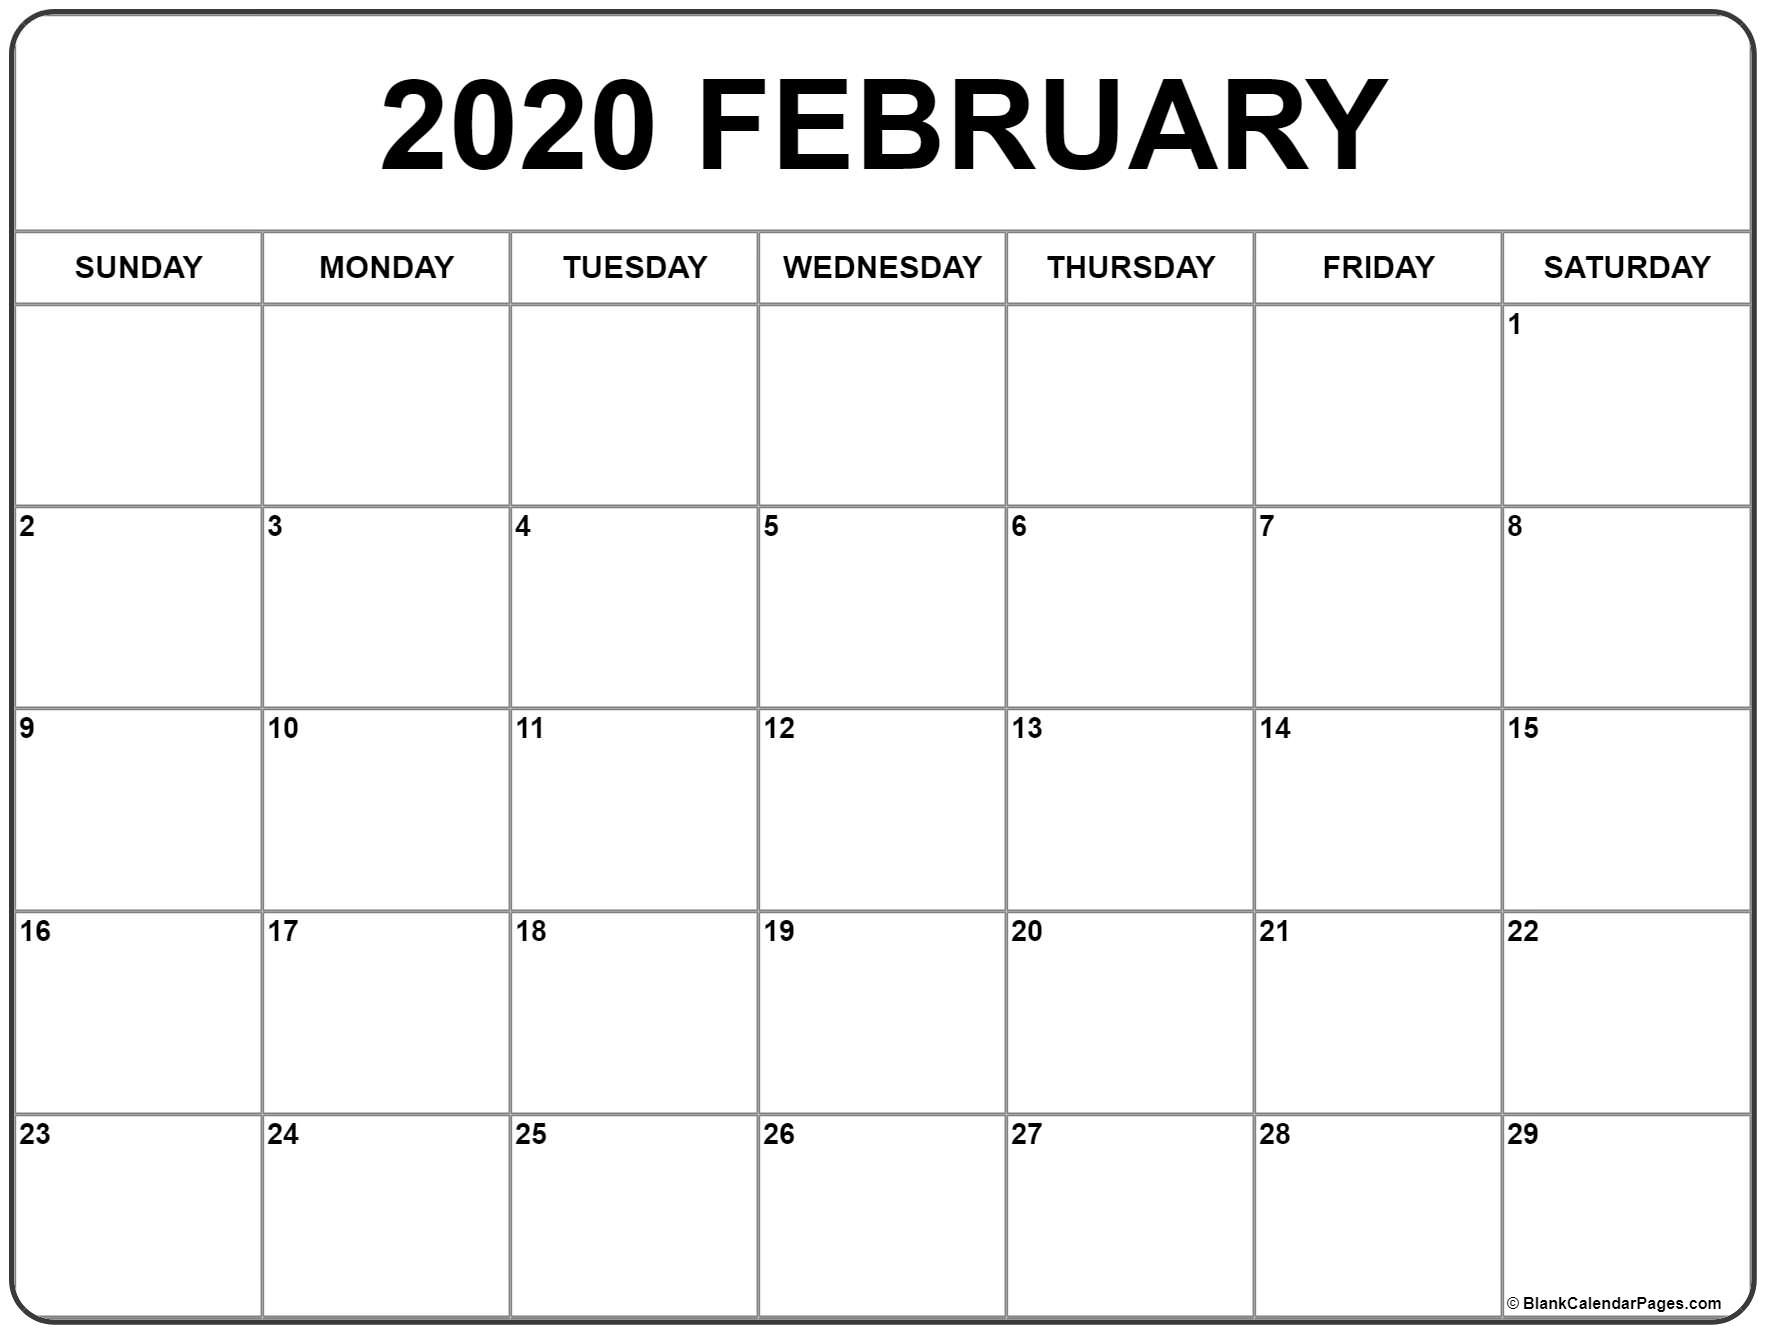 February 2020 Calendar | Free Printable Monthly Calendars  Feb 2020 Calendar